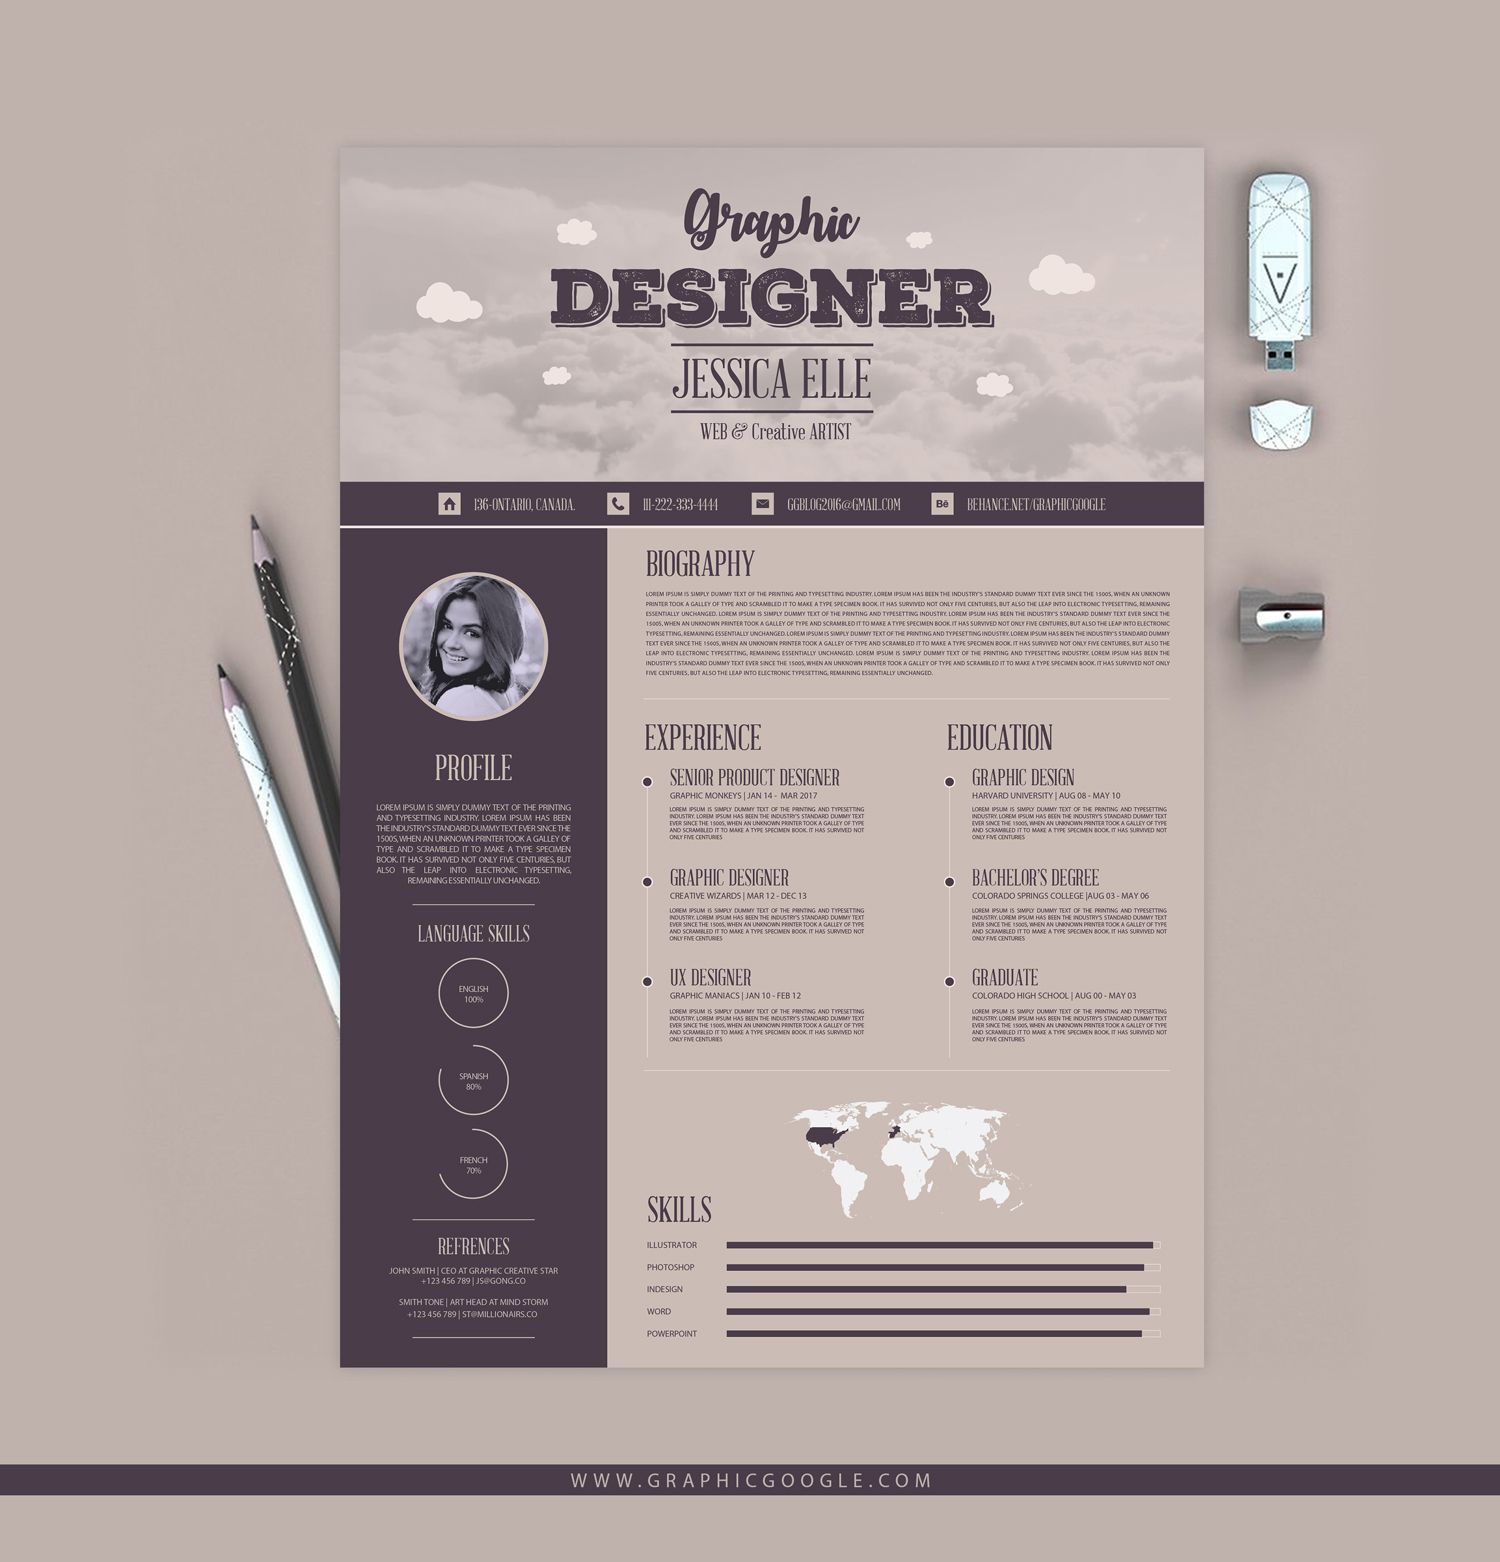 Free Vintage Resume Templates Freeresumetemplates Resume Templates Vintage Resume Design Free Resume Design Resume Design Template